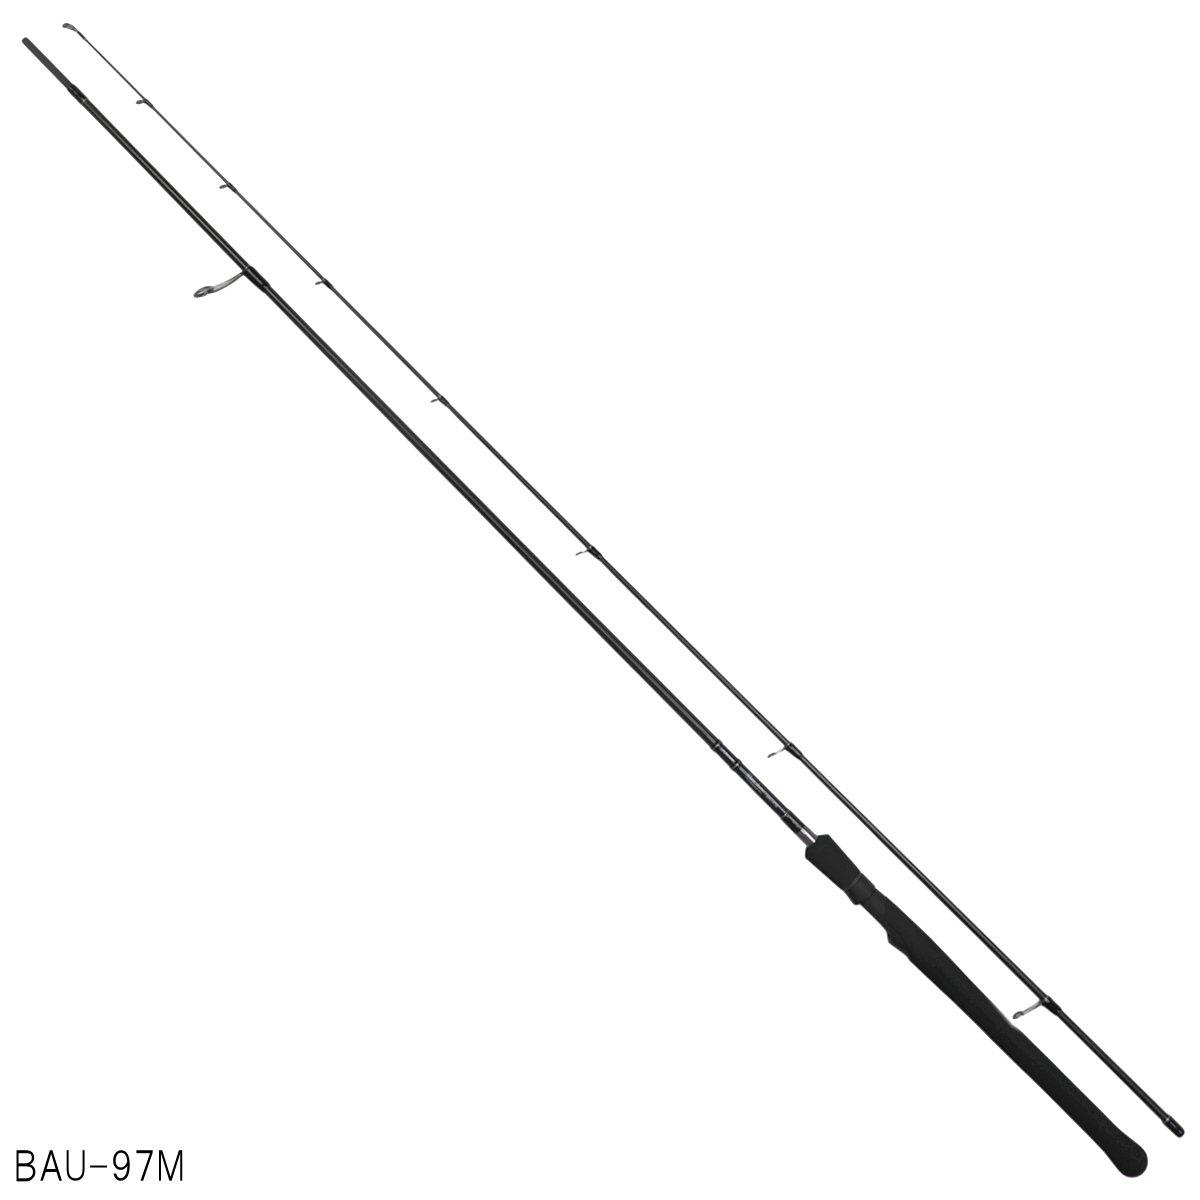 AIMS Black Arrow Unlimited BAU-97M【大型商品】